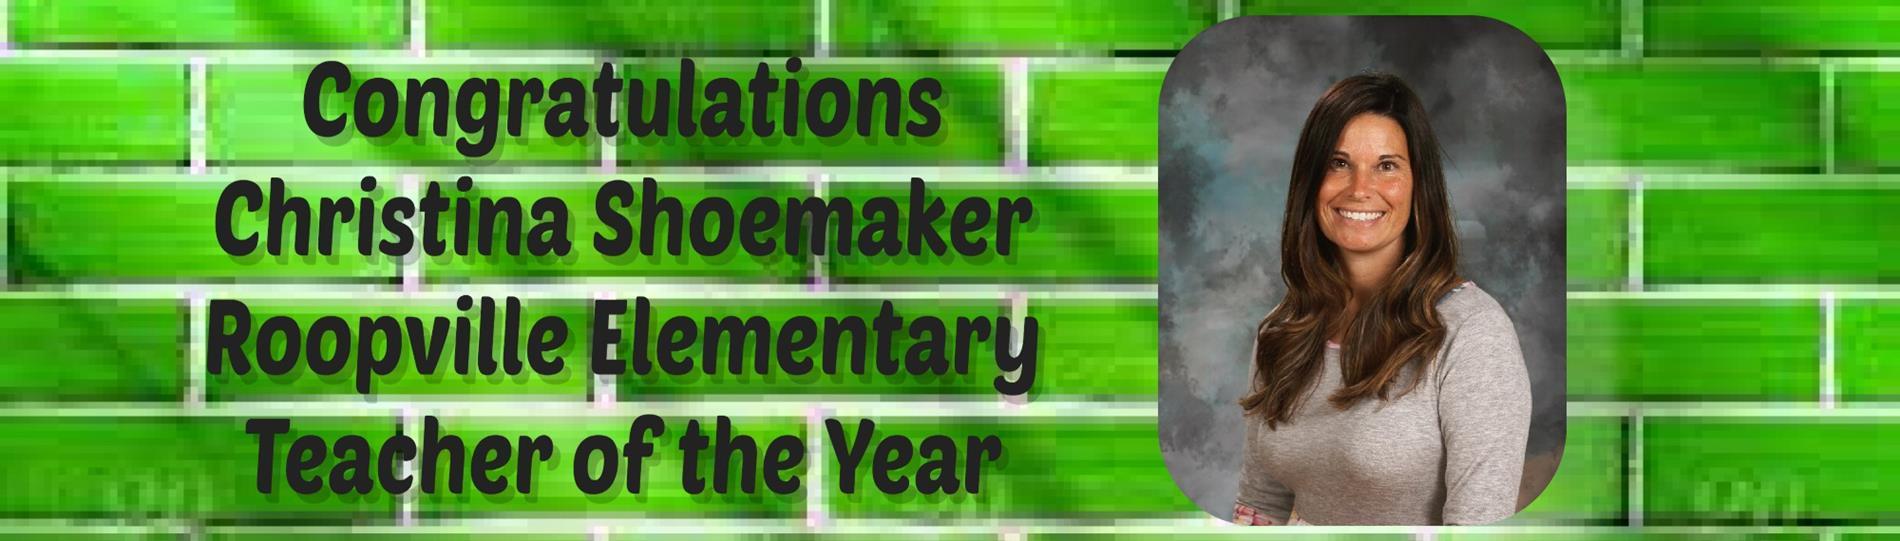 Christina Shoemaker Teacher of the Year